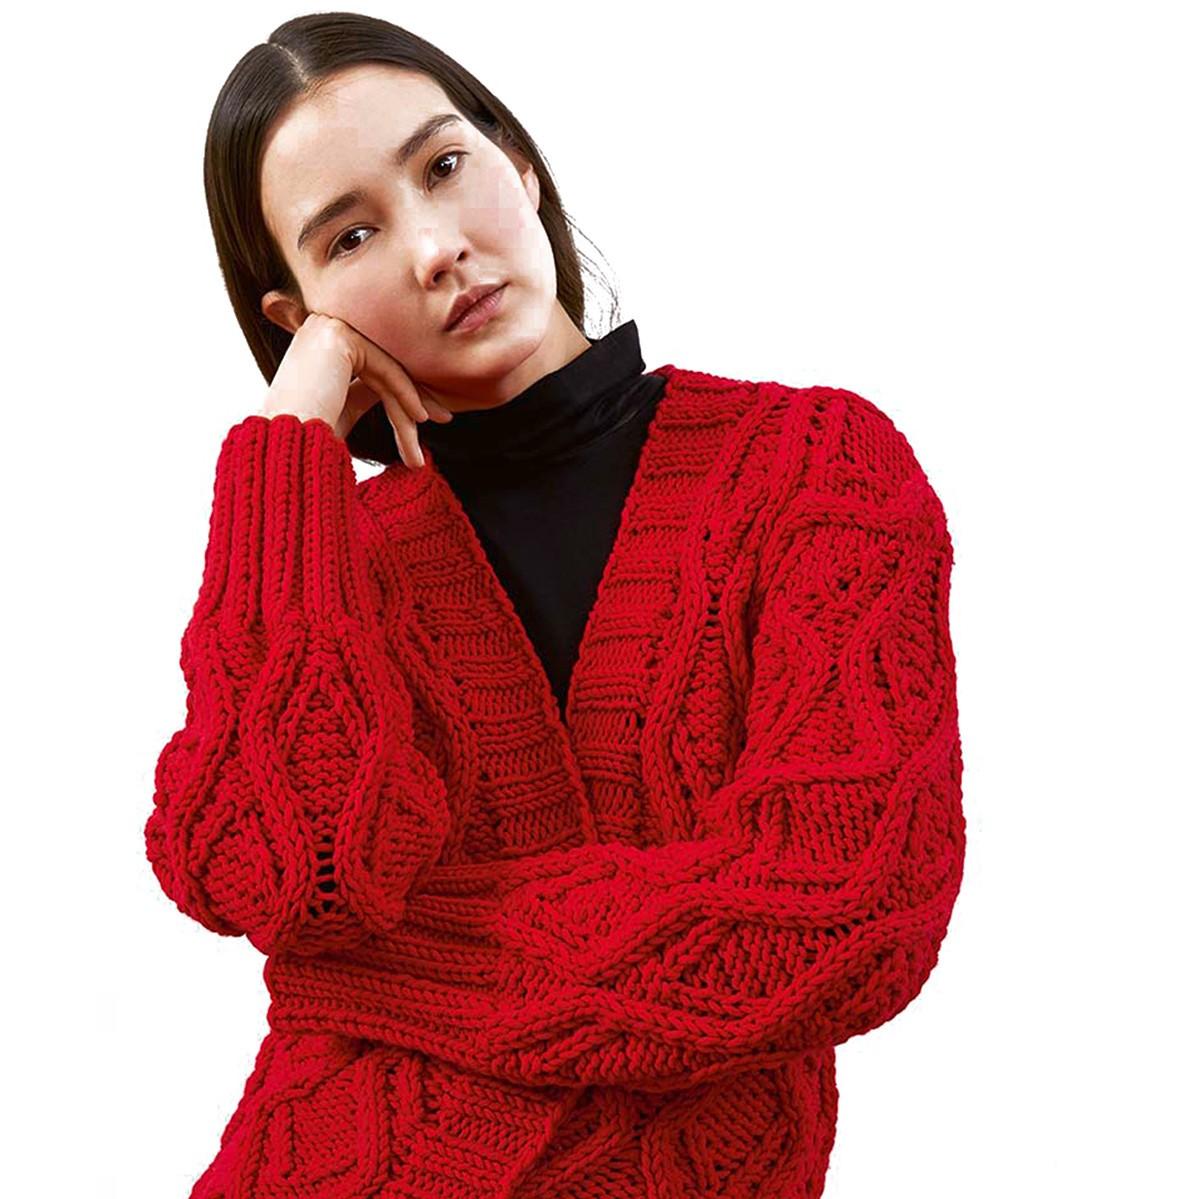 Knitting Wool and Yarn